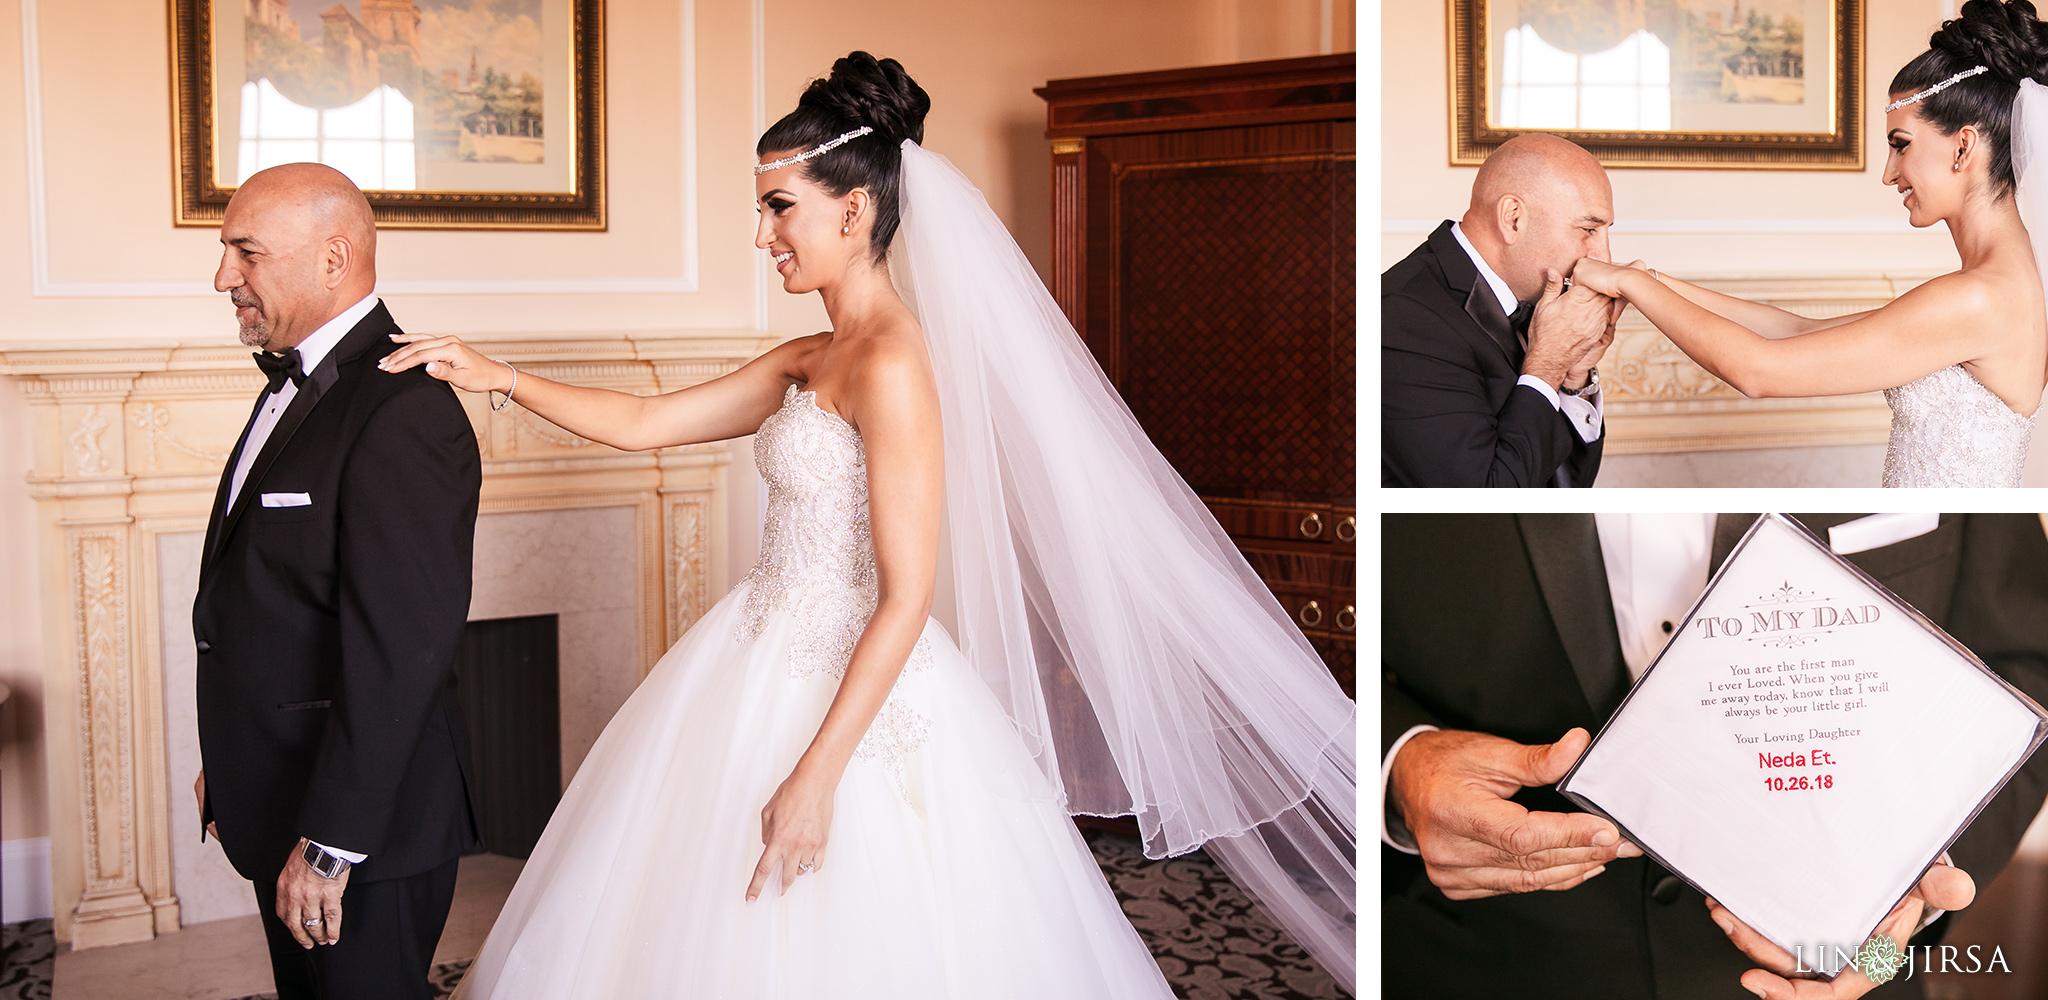 04 Biltmore Hotel Los Angeles Wedding Photography